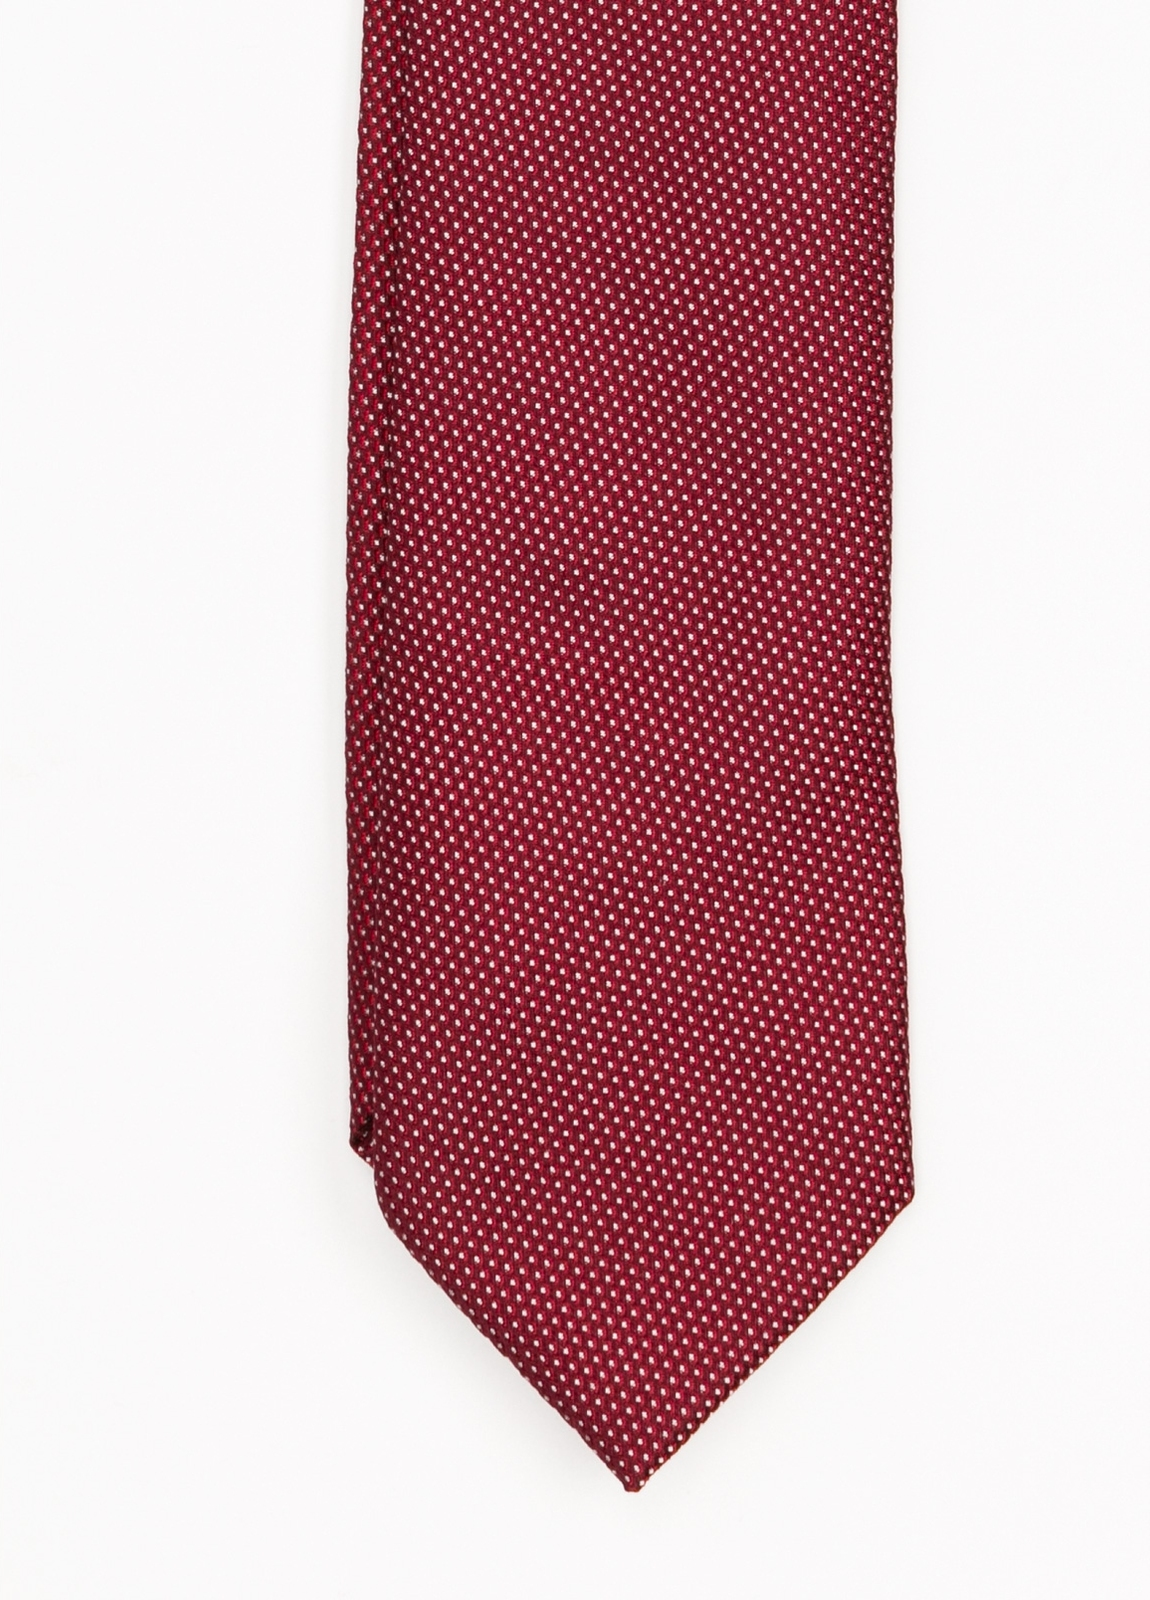 Corbata Formal Weat textura color granate. Pala 7,5 cm. 100% Seda.